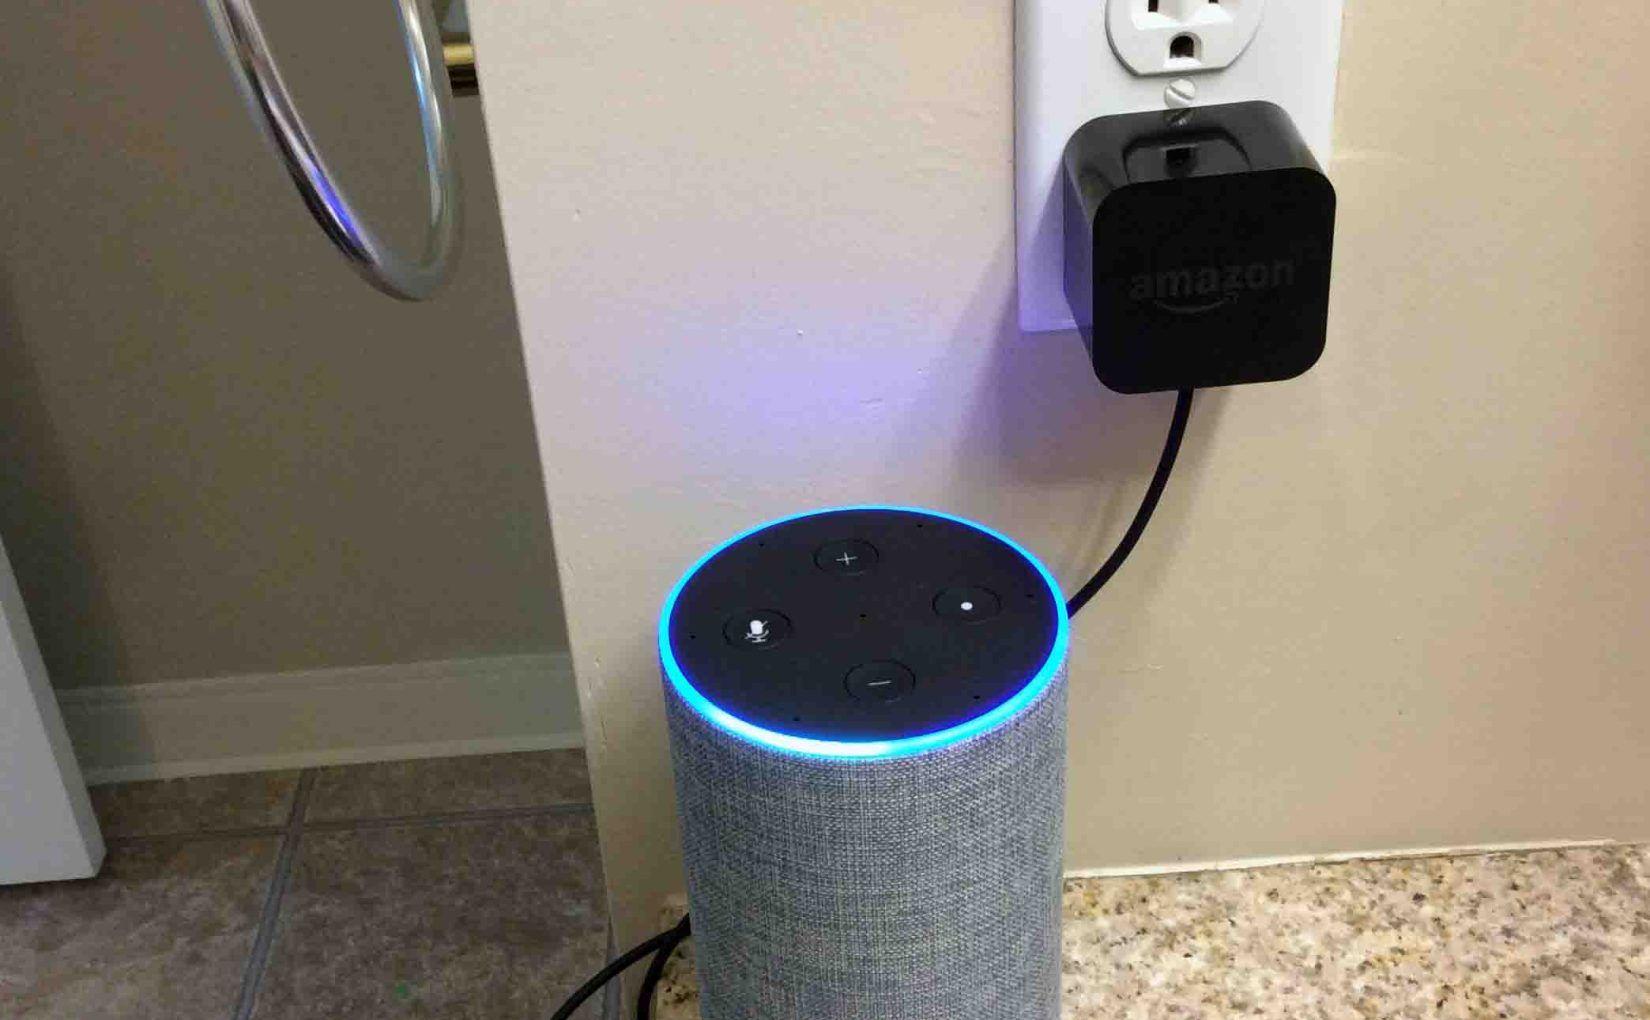 Do You Need Amazon Prime to Use Echo Speakers Tom's Tek